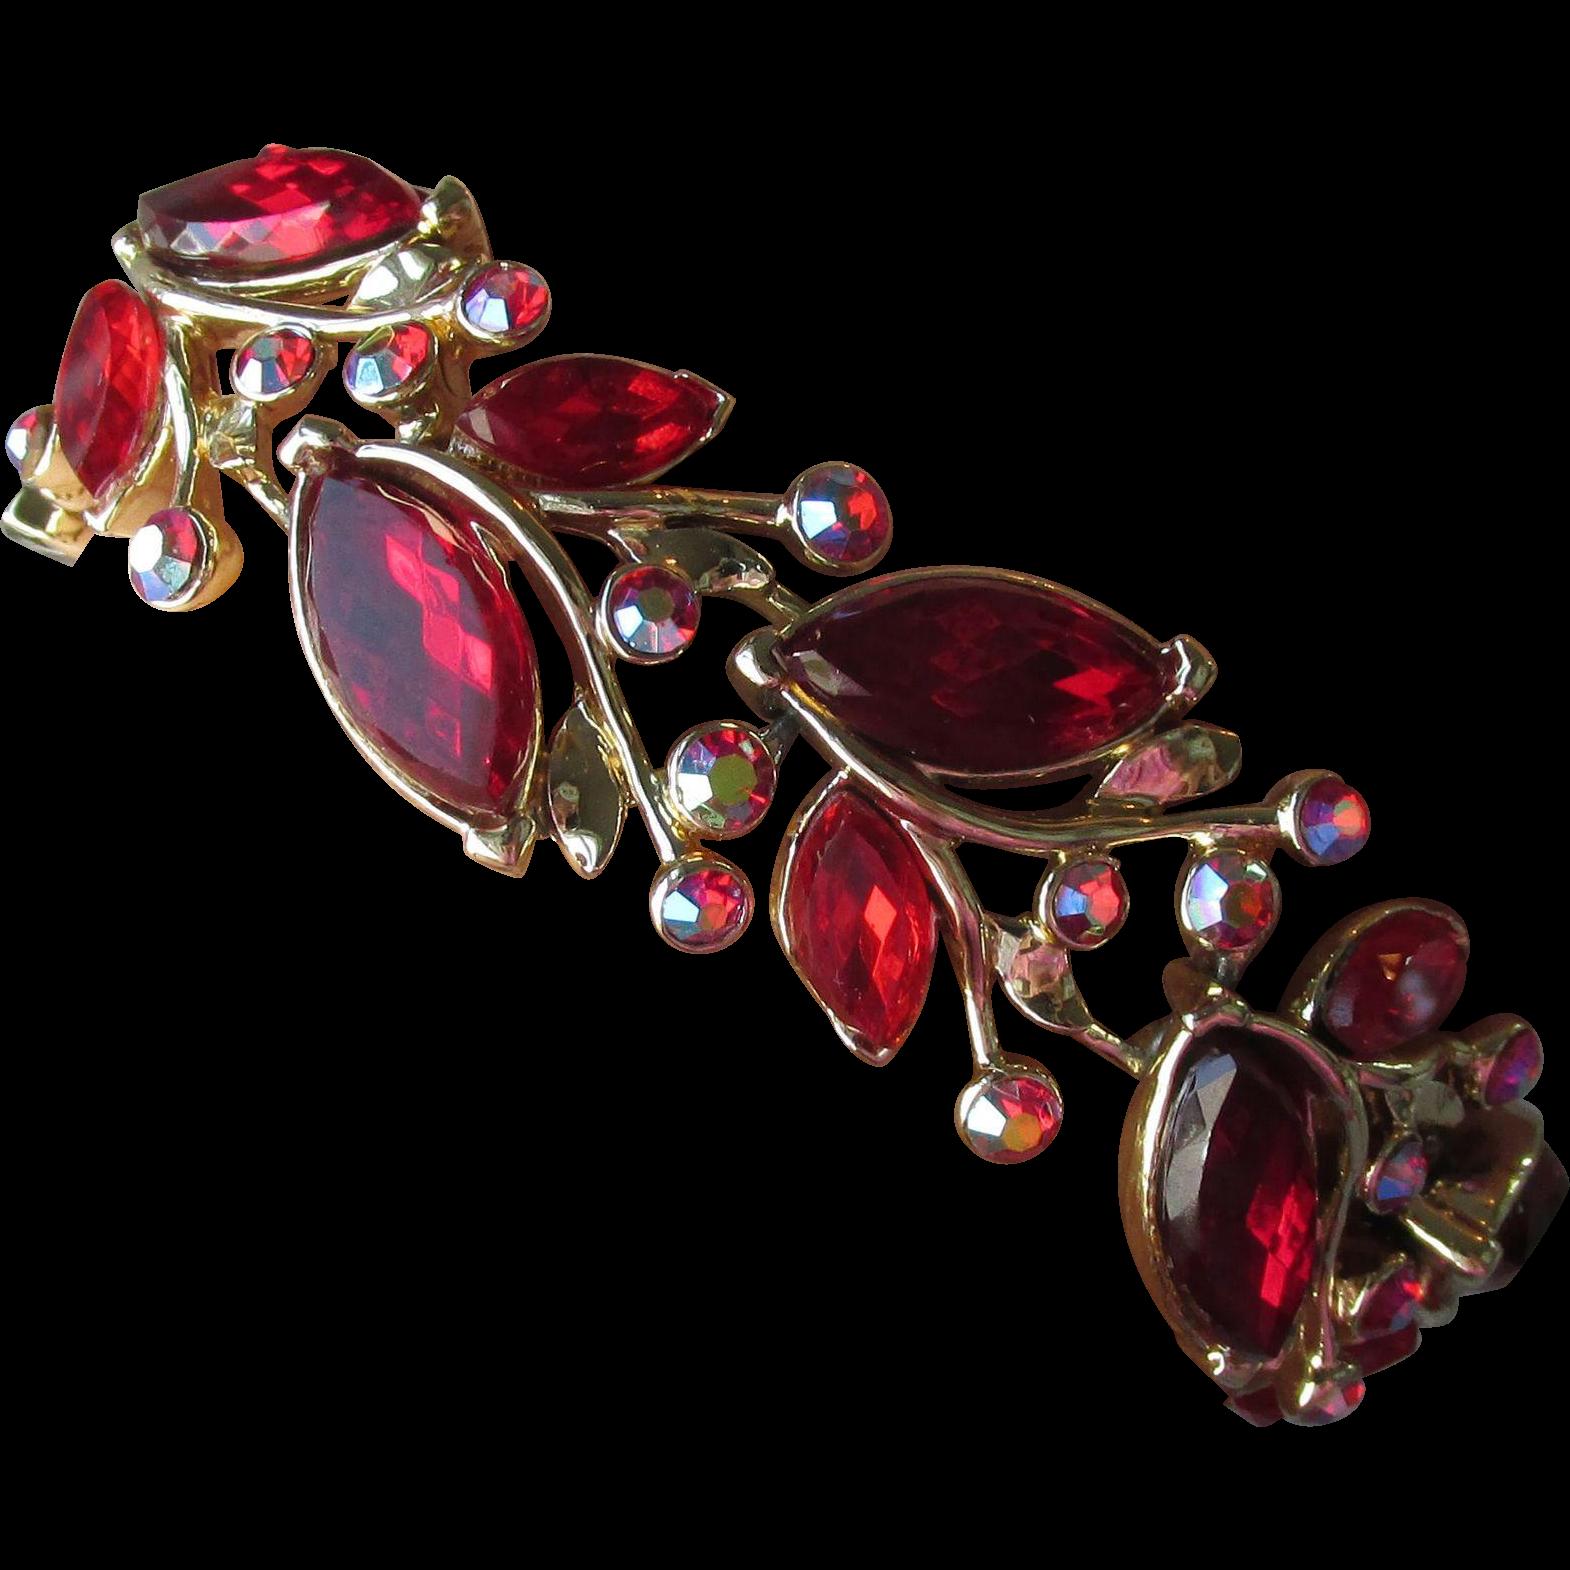 Spectacular Vintage Signed STAR Red Marquise Rhinestone Bracelet